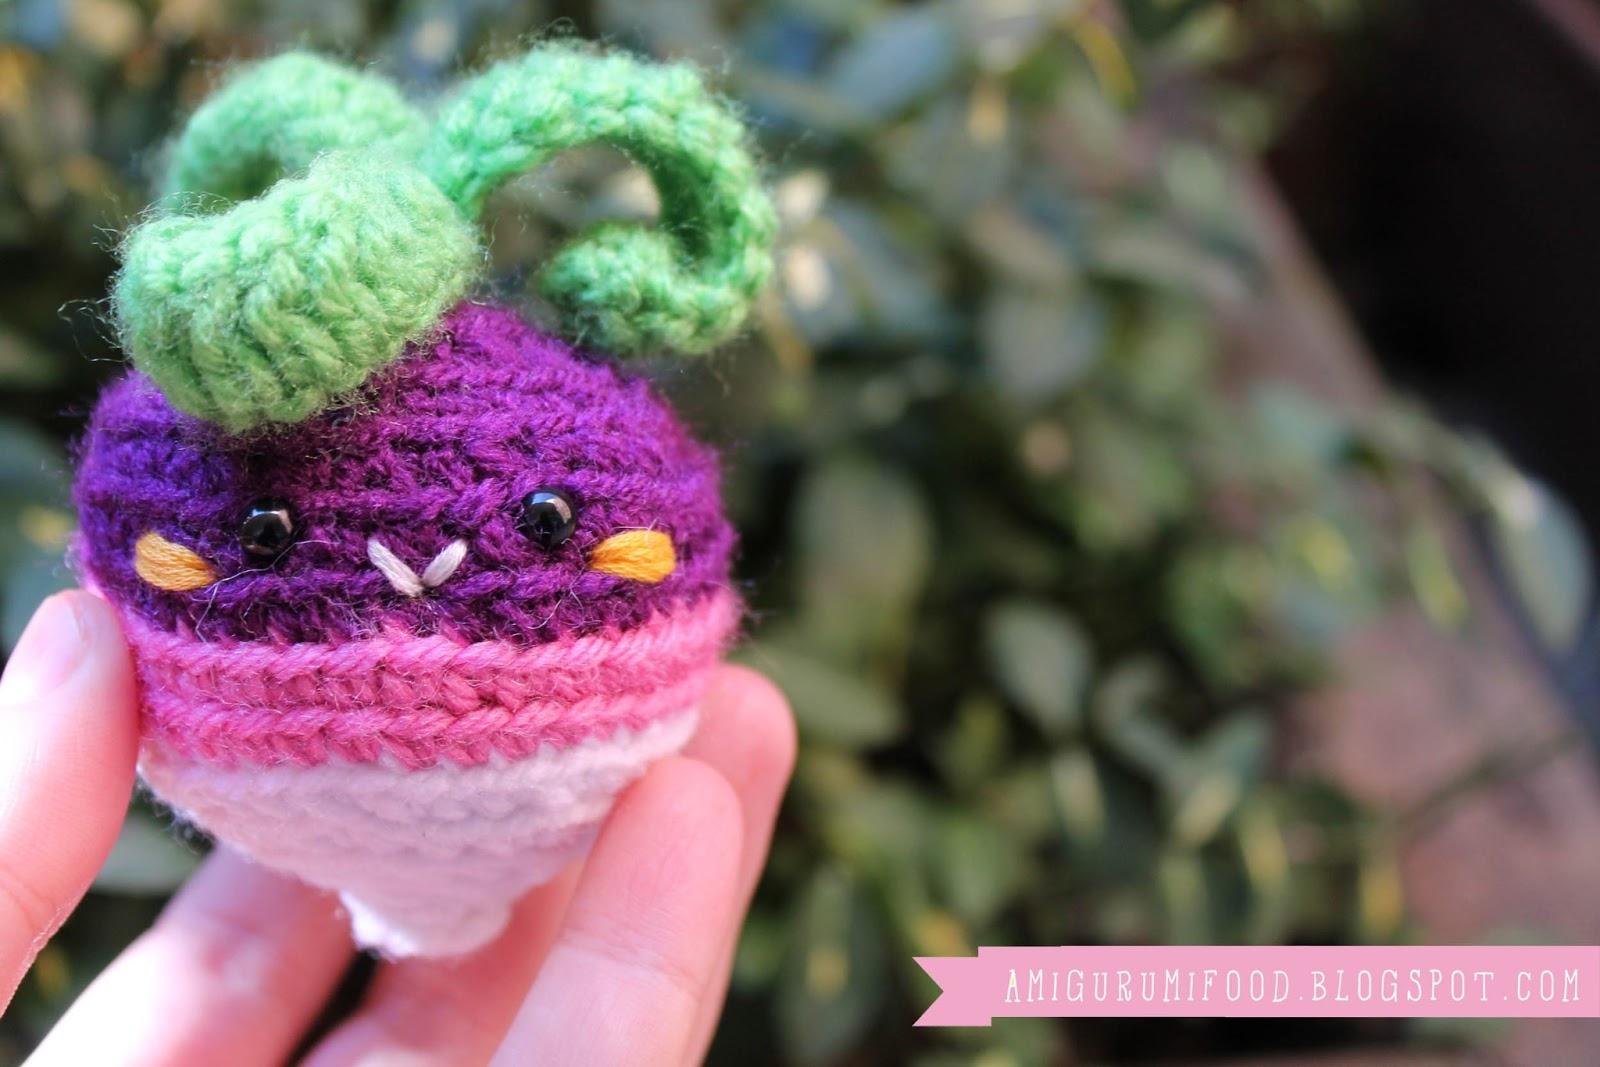 Amigurumi Vegetables : Susie farmgirl amigurumi ducks free crochet pattern